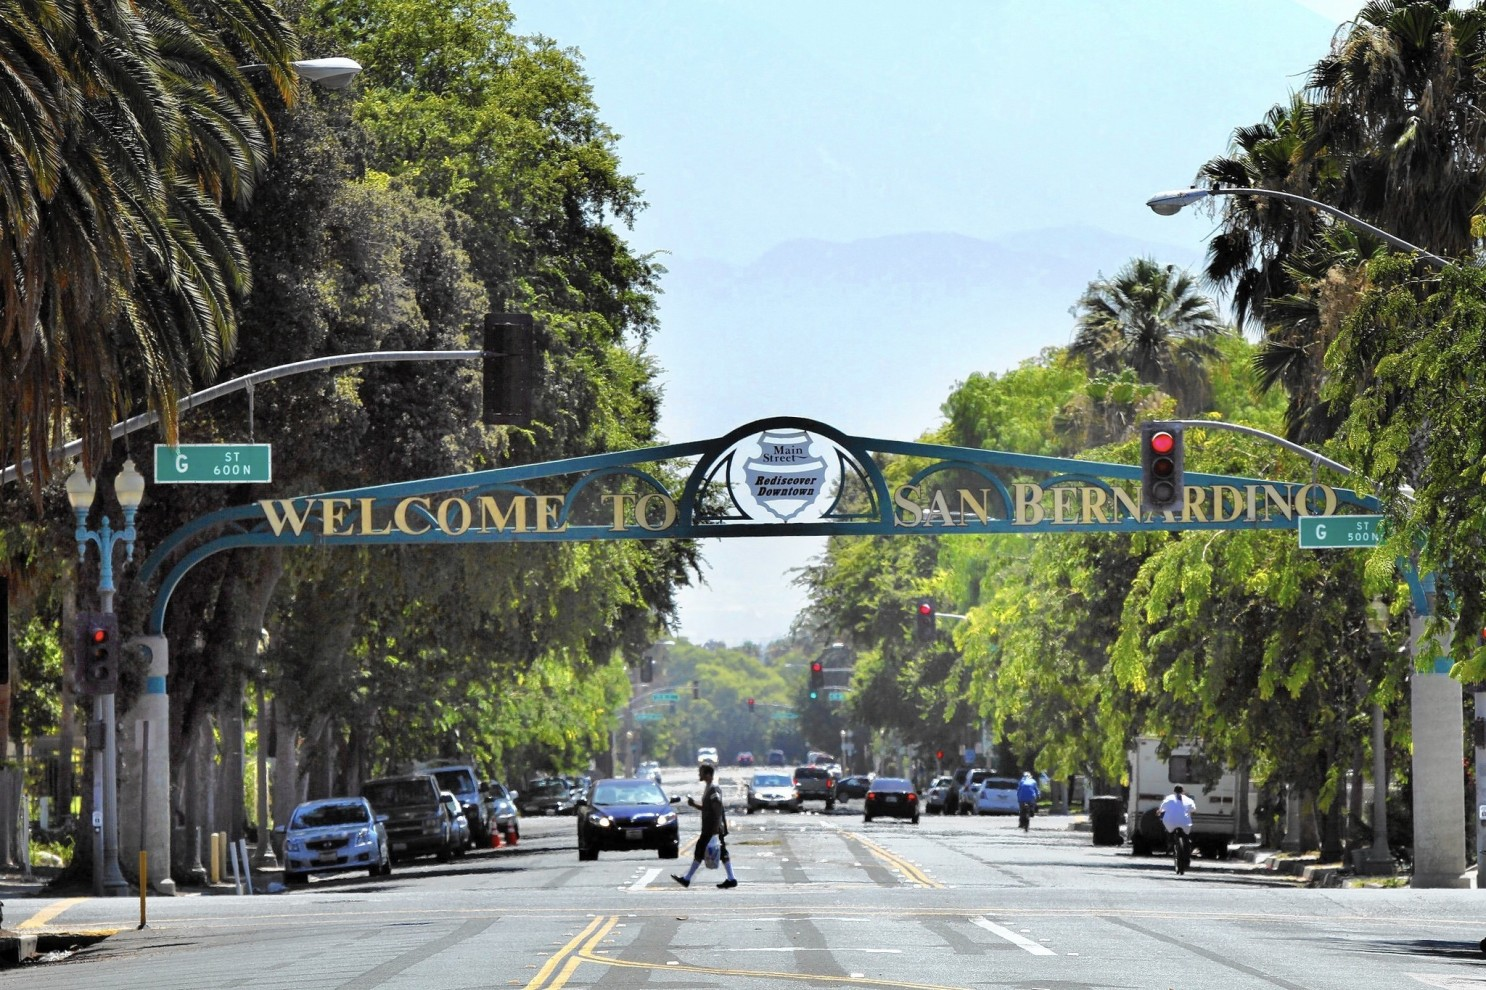 San Bernadino County